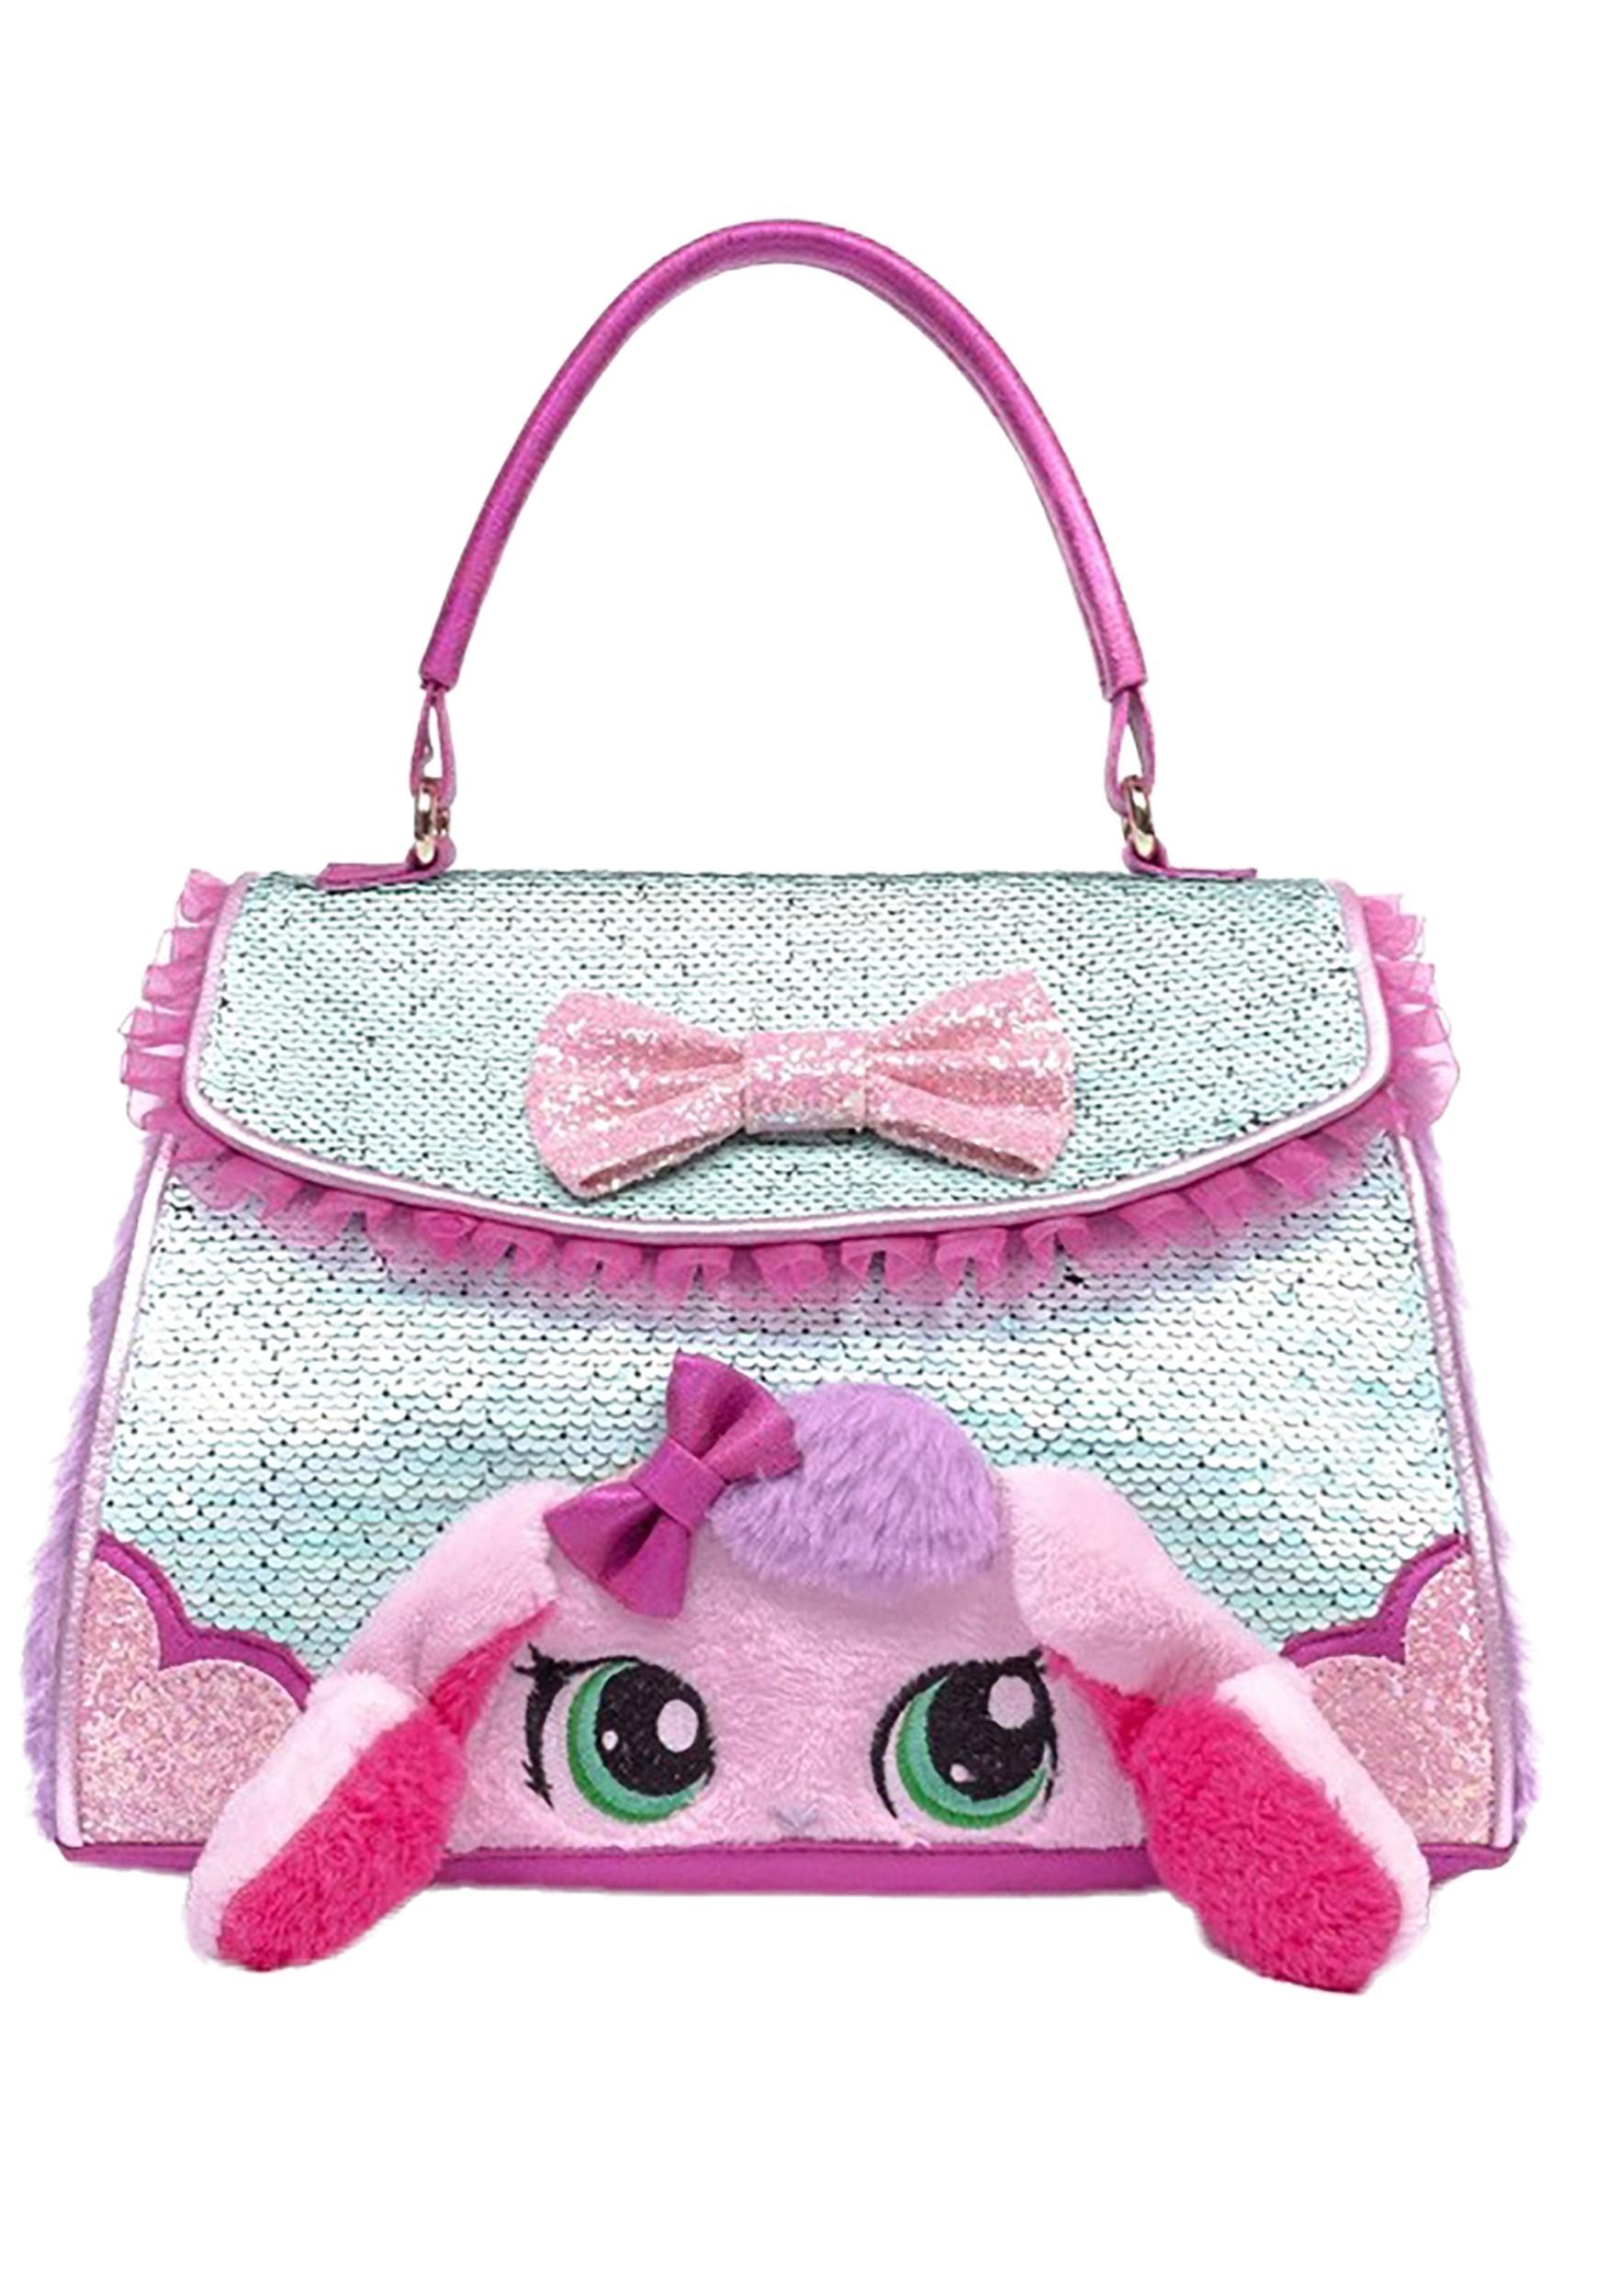 Irregular Choice Bella Bunny Hand Bag Purse